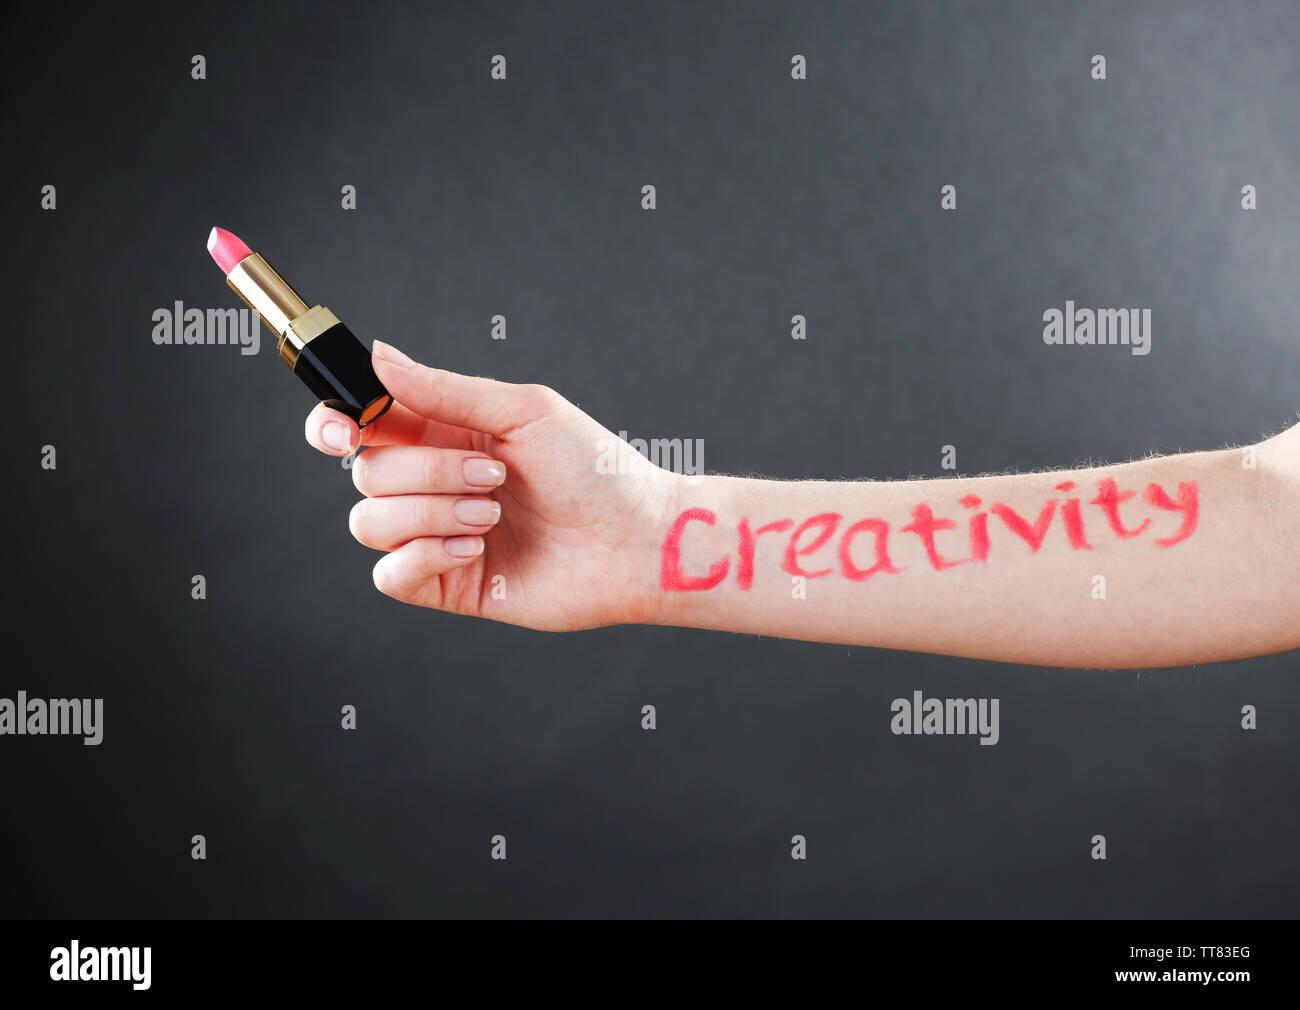 Word creativity written on female hand on black background - Stock Image